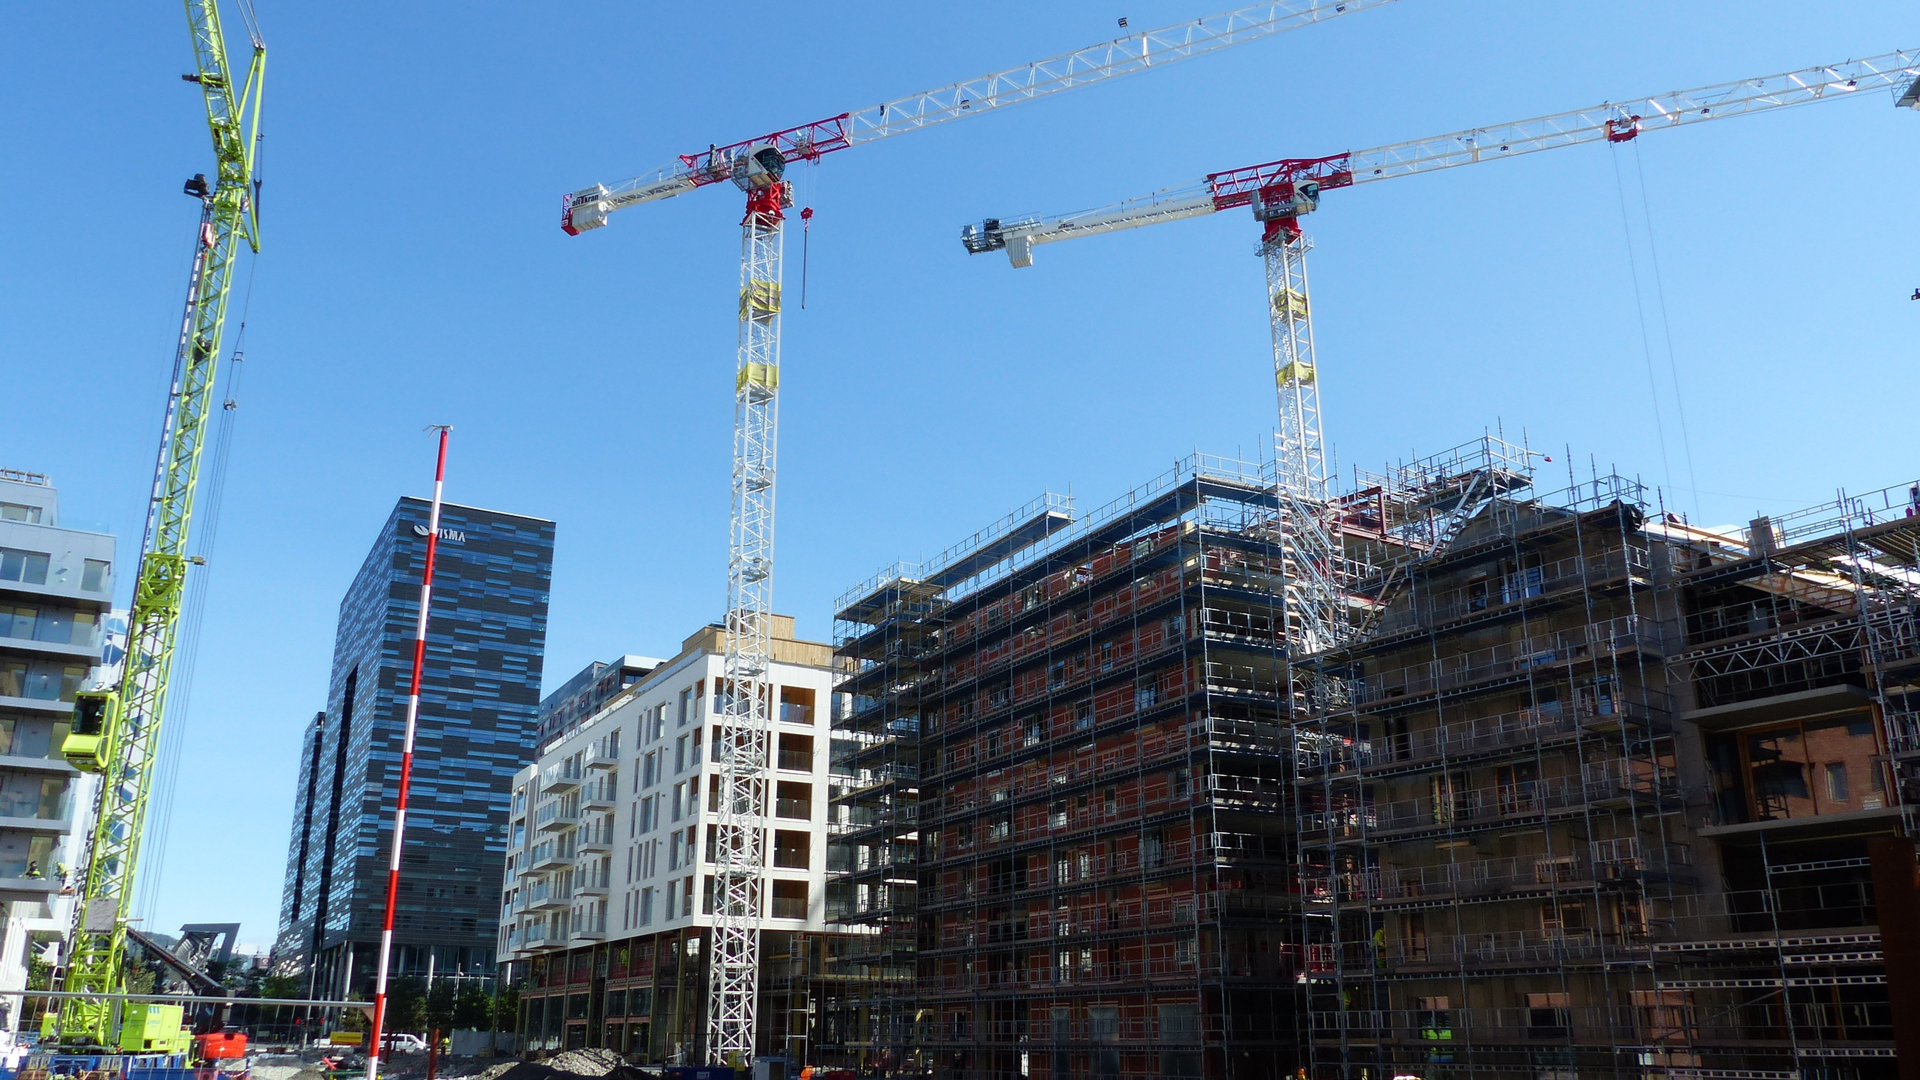 Færre byggeprosjekter i pressområder